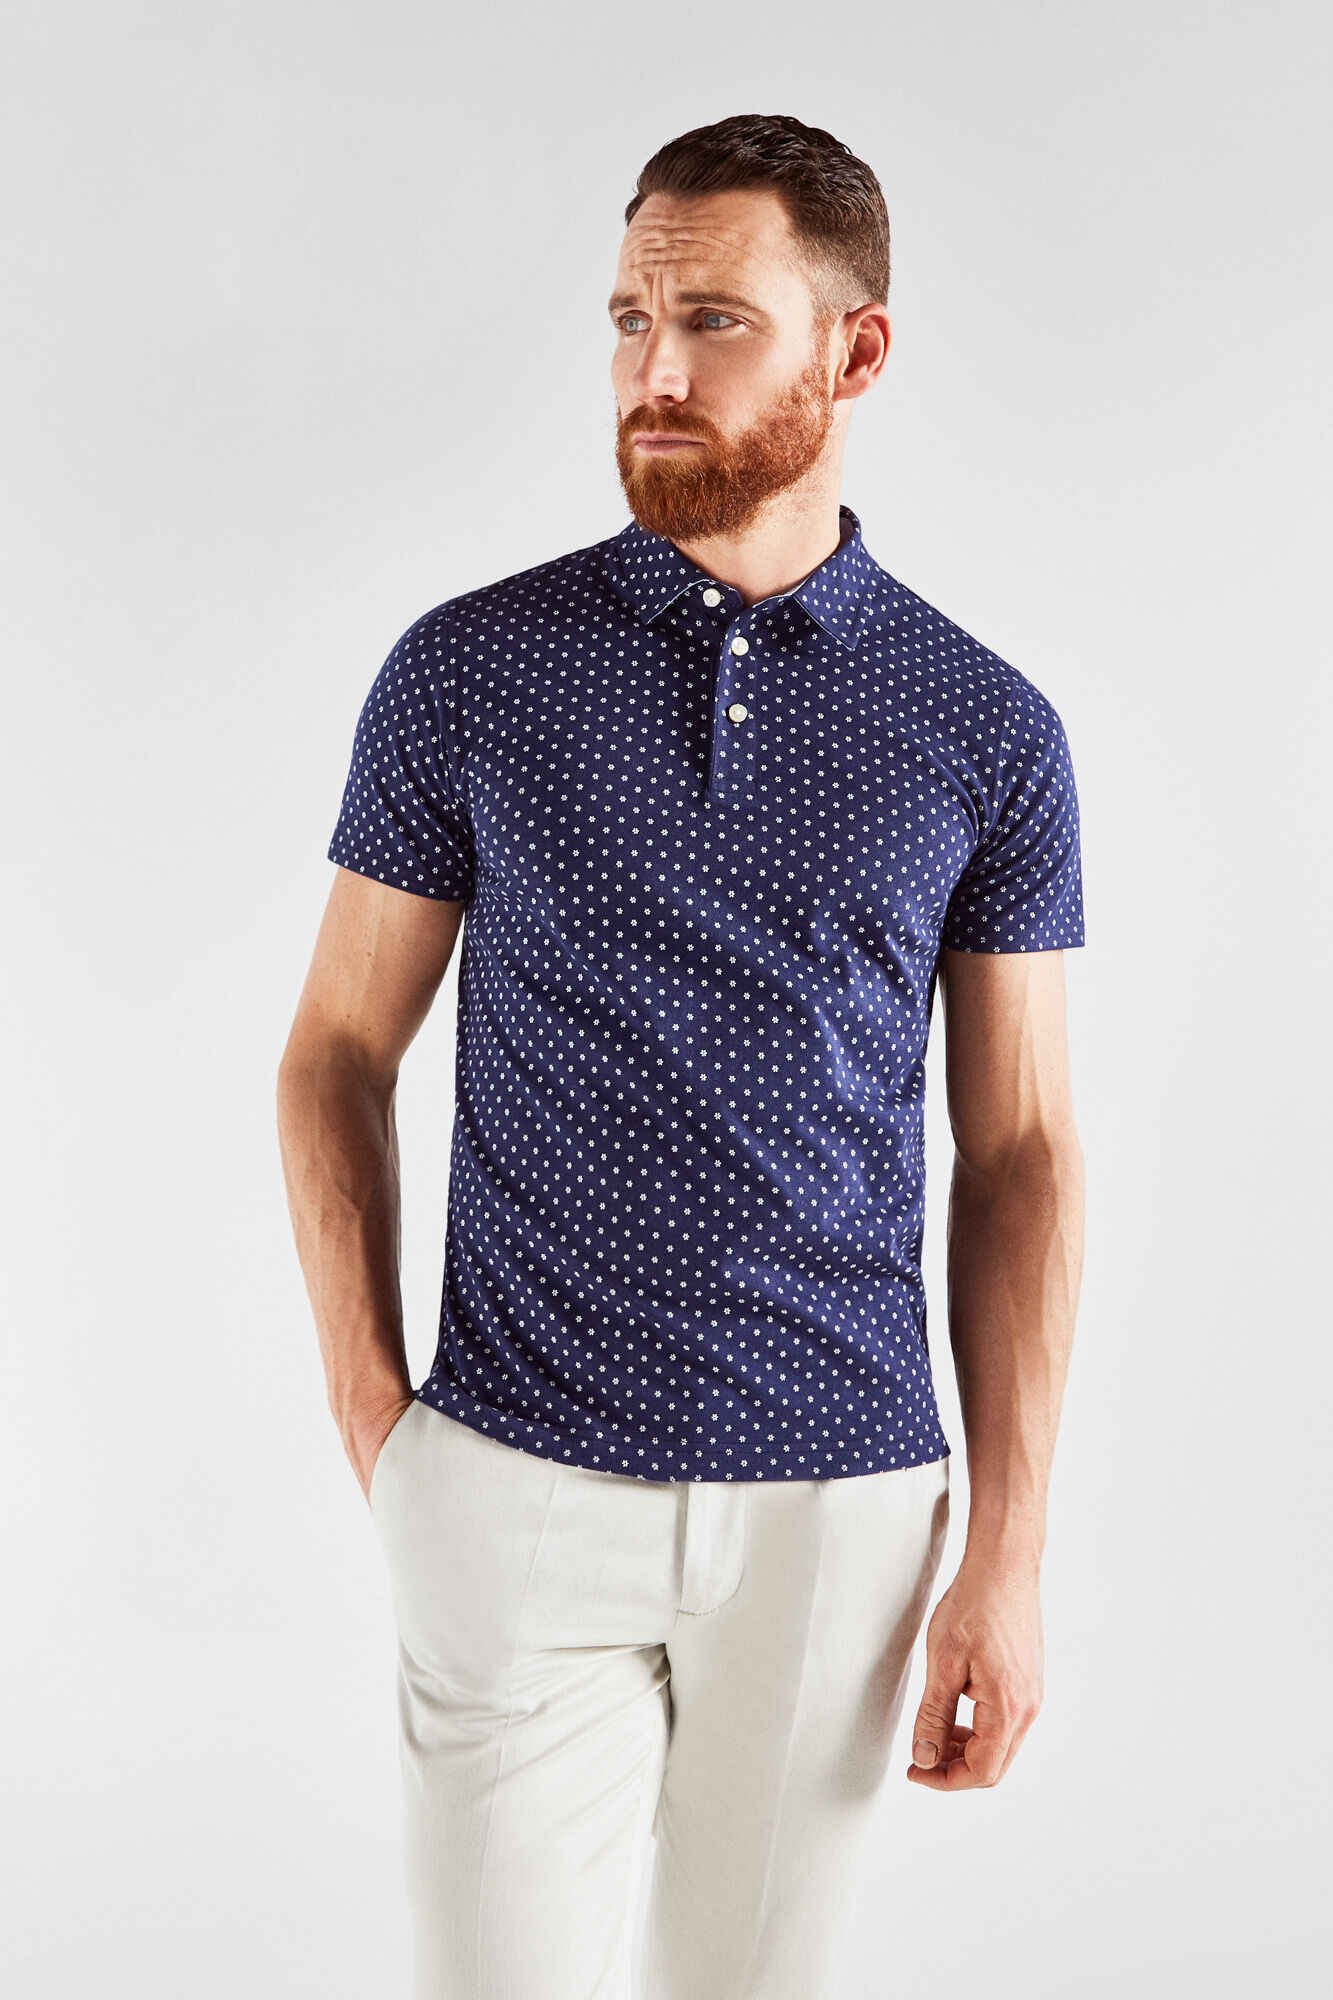 Promo Harga Polo Navy Shirt Jeans Terbaru 2018 T Kaos Pria Distro Hrcn H 0246 Short Sleeved Polos And Shirts Cortefiel Man Woman